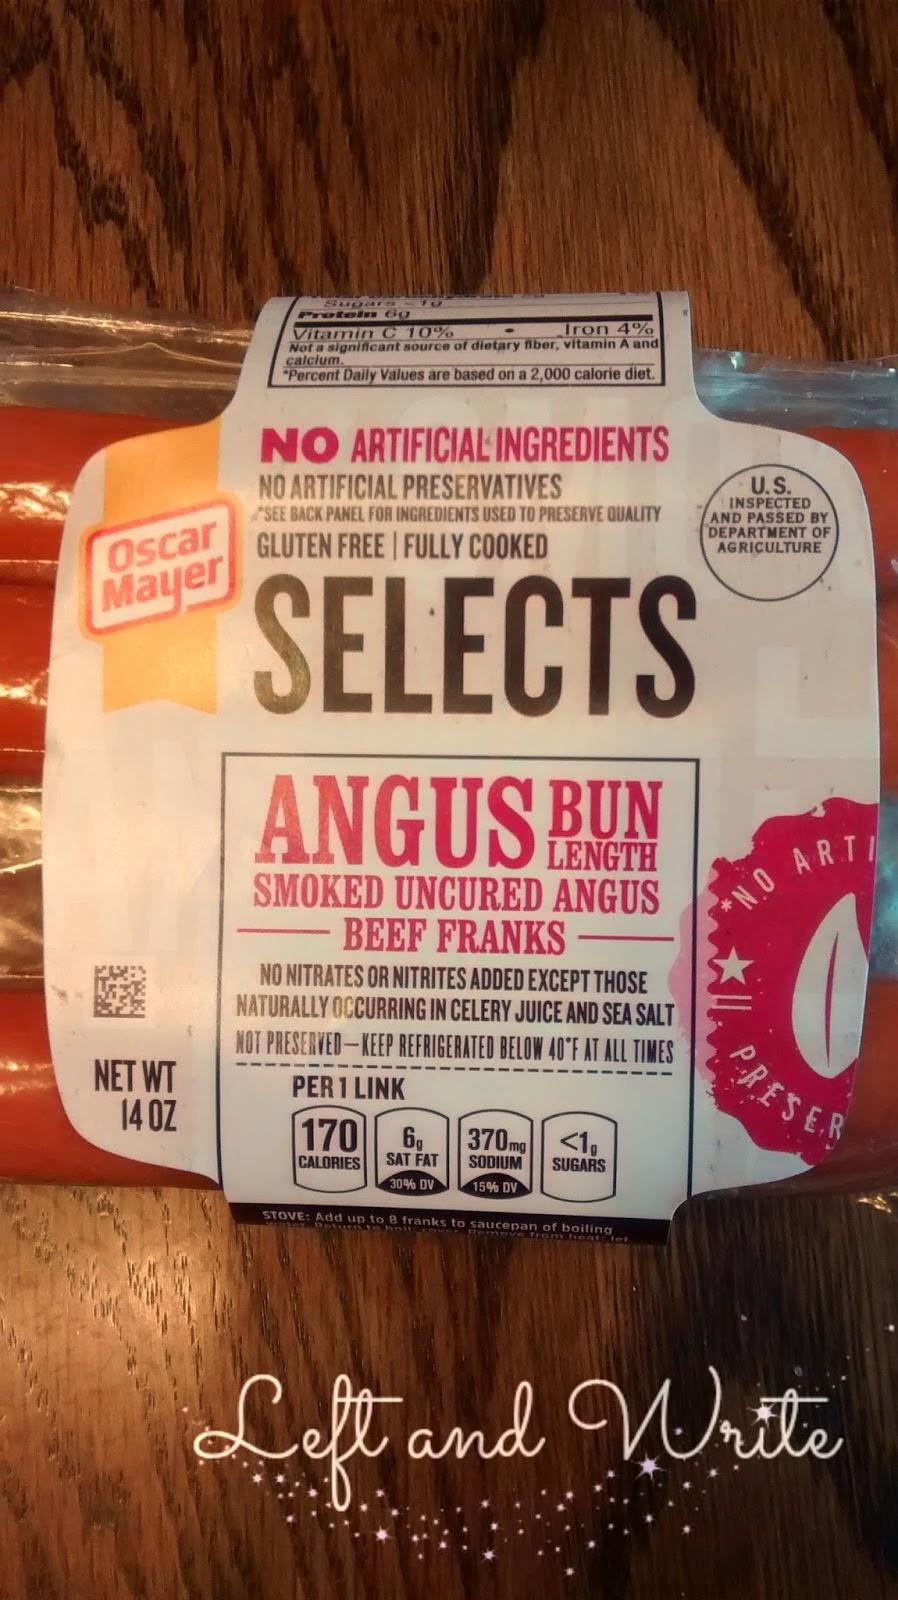 Left And Write Gluten Free Baking Powder Biscuits